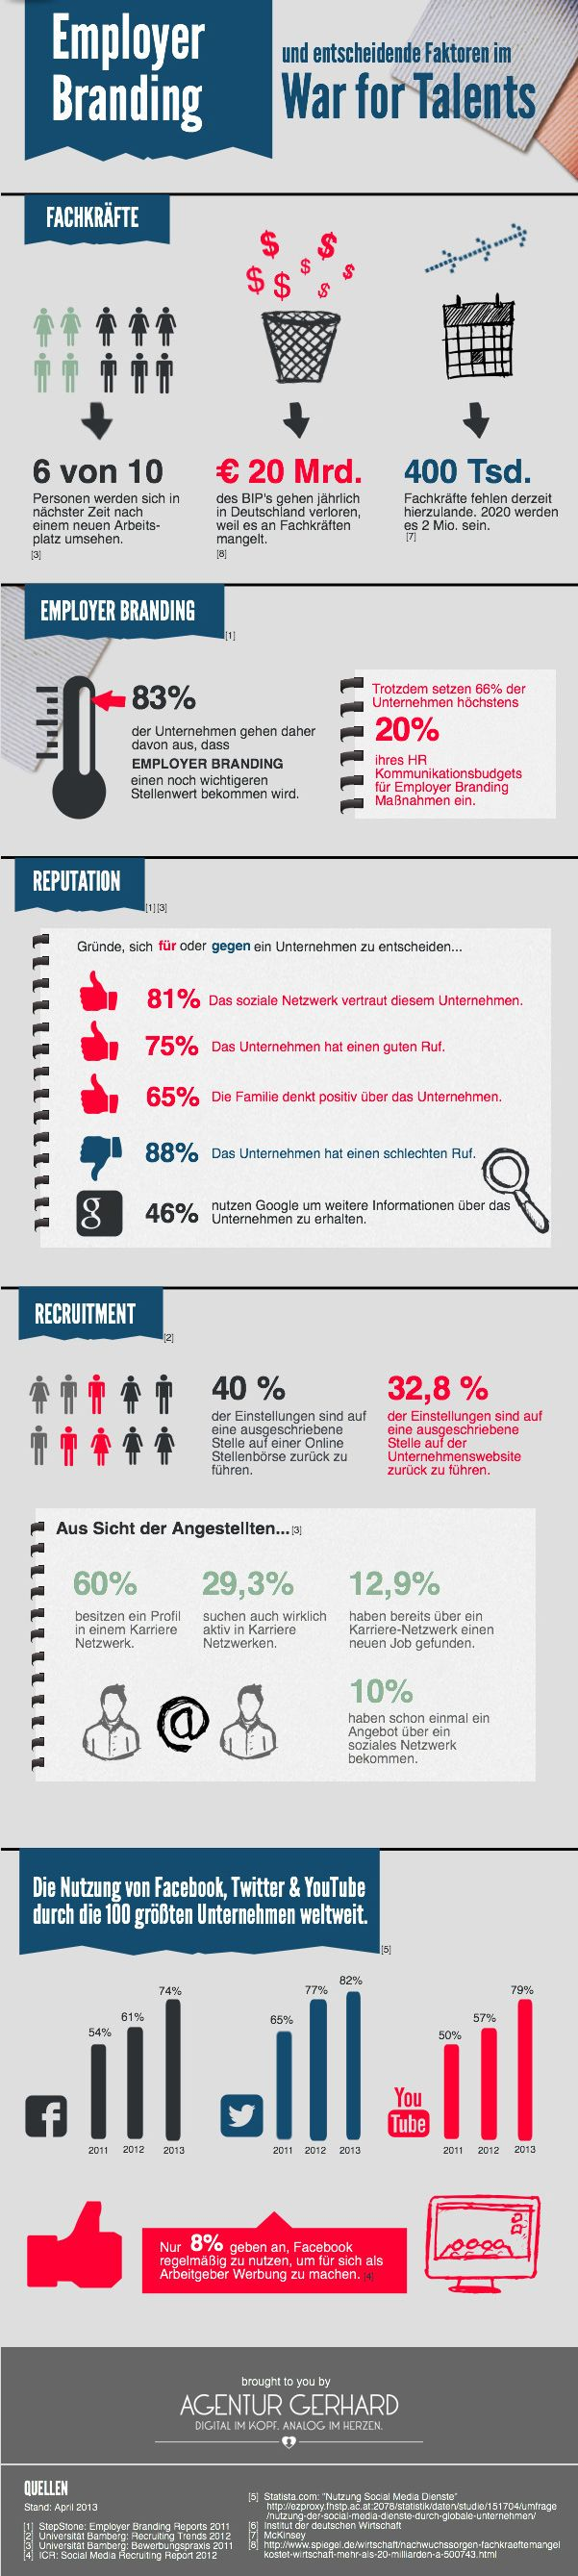 "Interessante Infografik zum Thema ""War for Talents"". 20 Mrd. Euro jährlich... (via @Agentur GERHARD)"